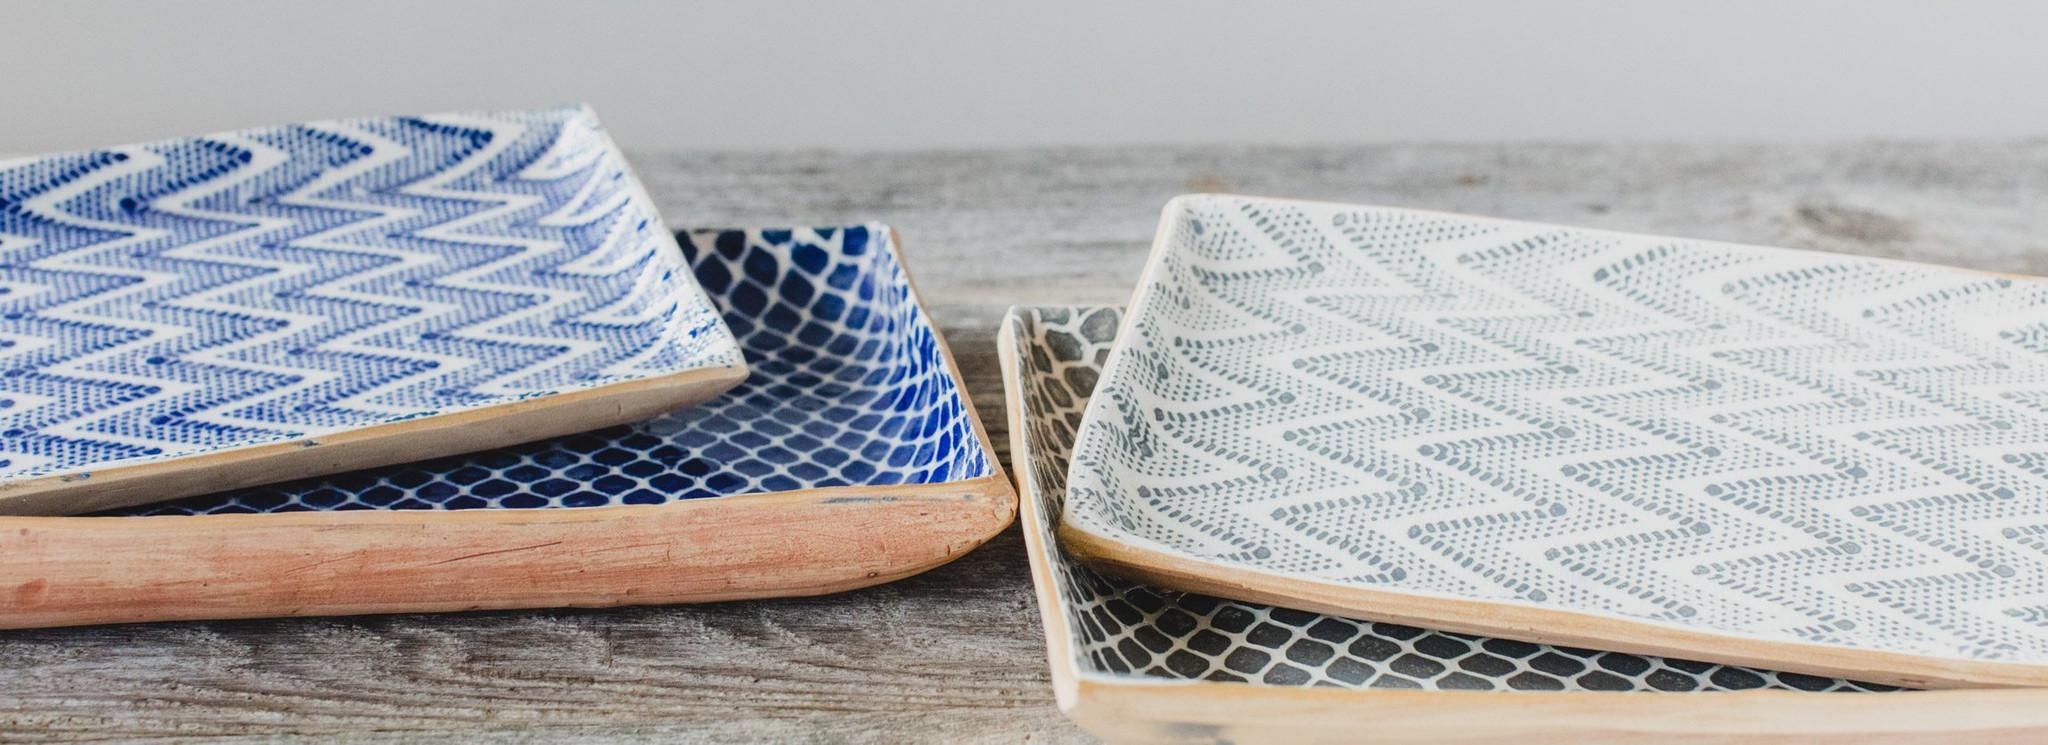 Ceramic Serving Platters